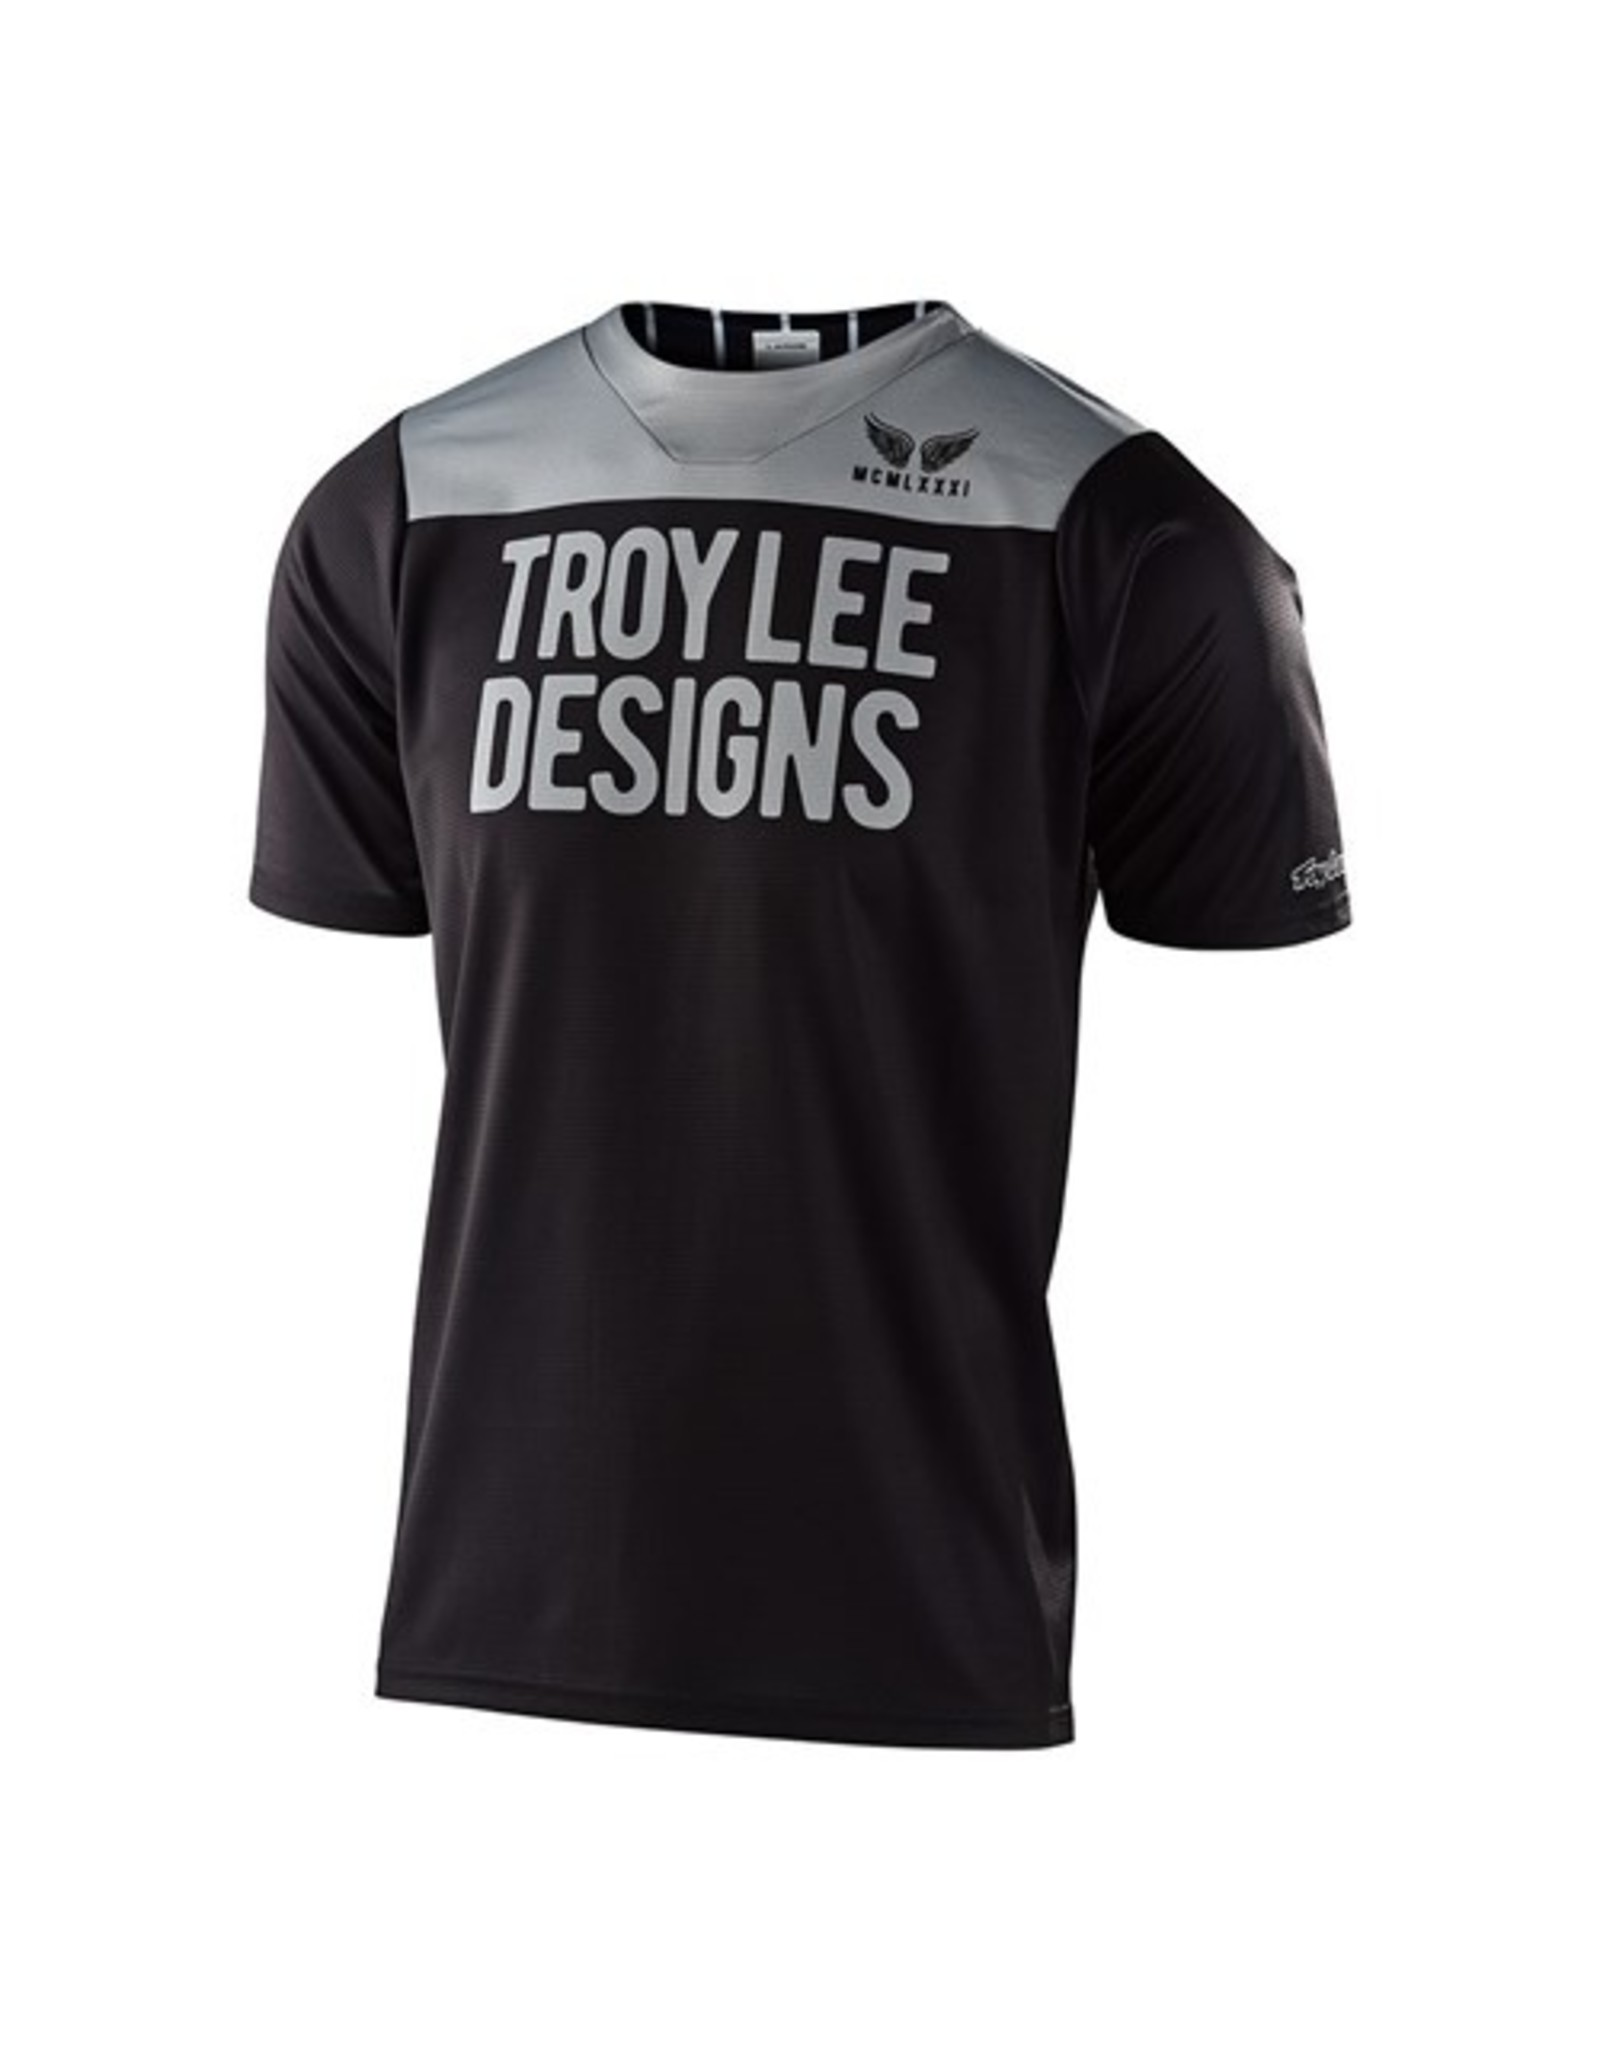 Troy Lee Designs TLD 20 SKYLINE YOUTH SS JERSEY